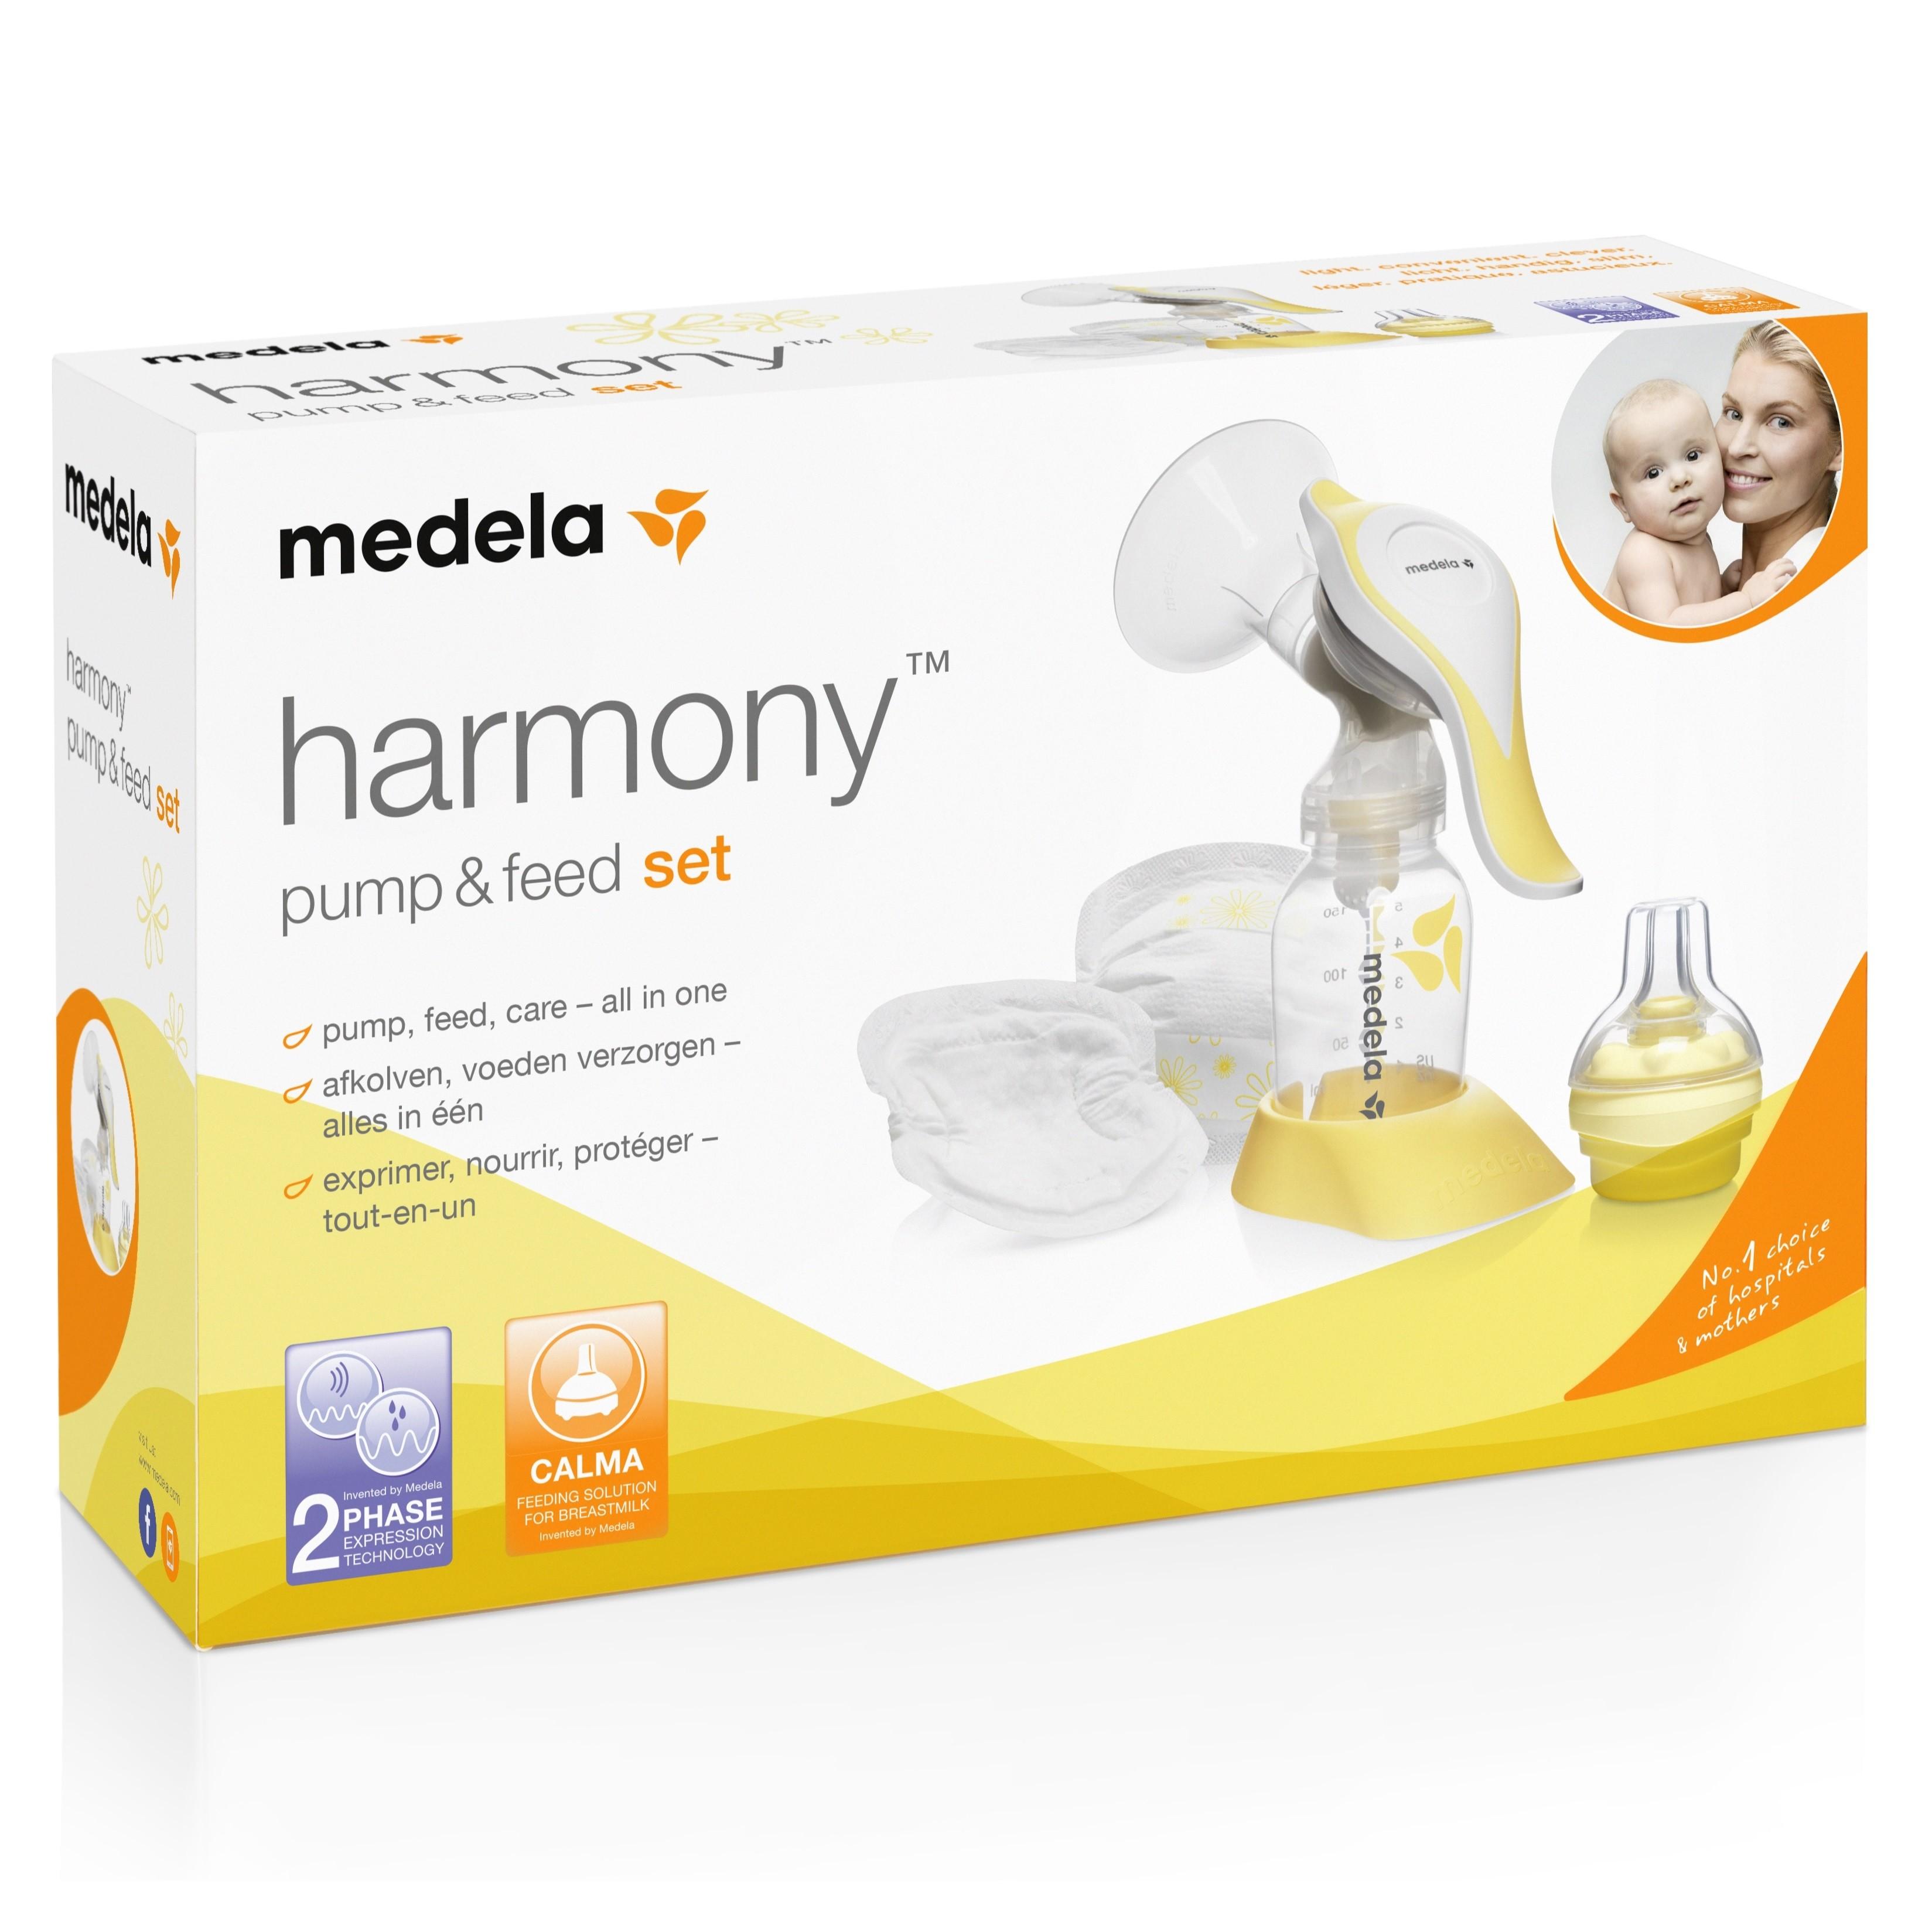 Молокоотсос Medela Harmony ручной, 1шт. truper pcl e 31188